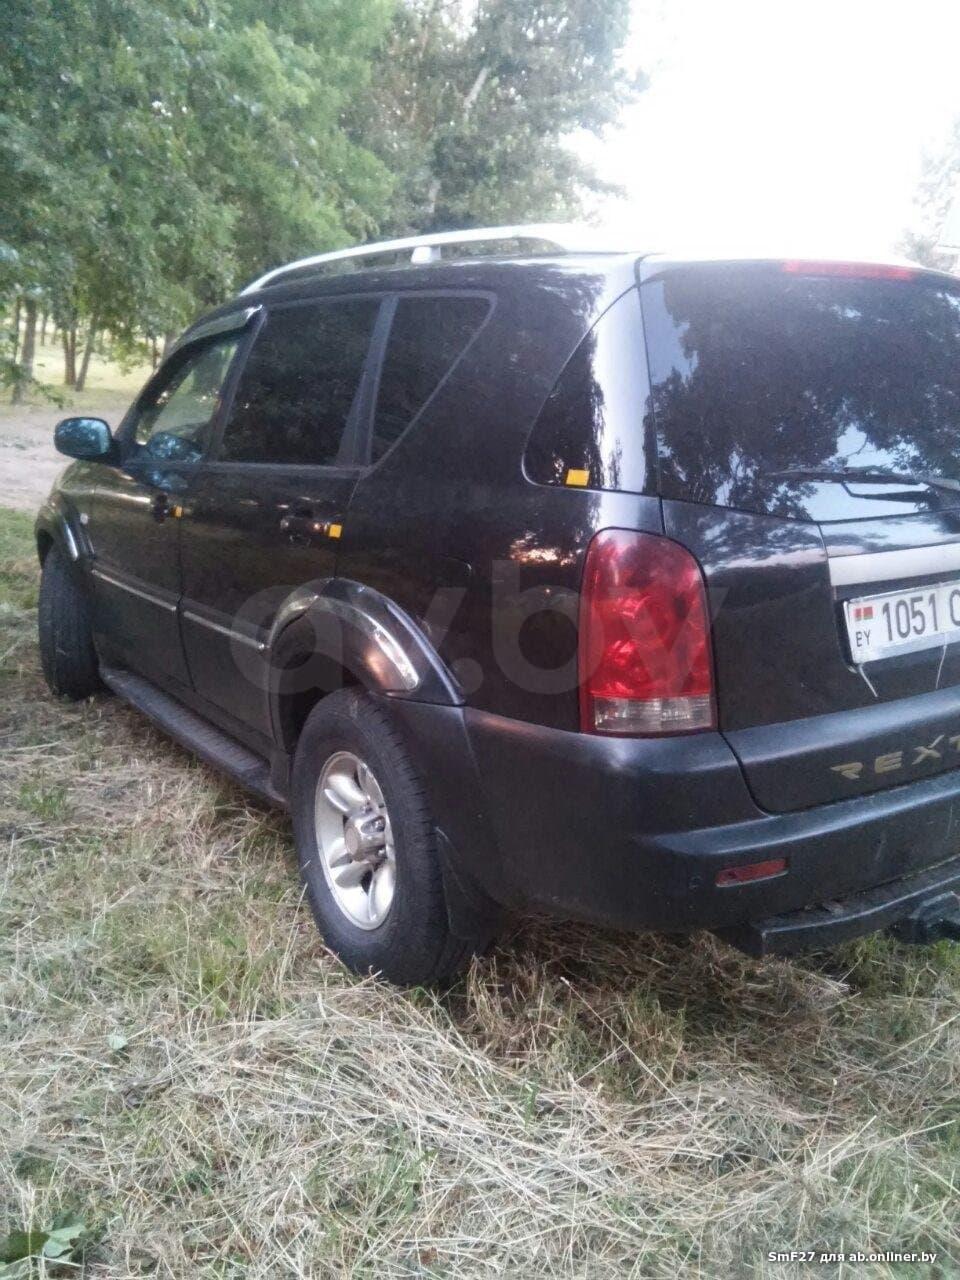 SsangYong Rexton I RX270 XDI